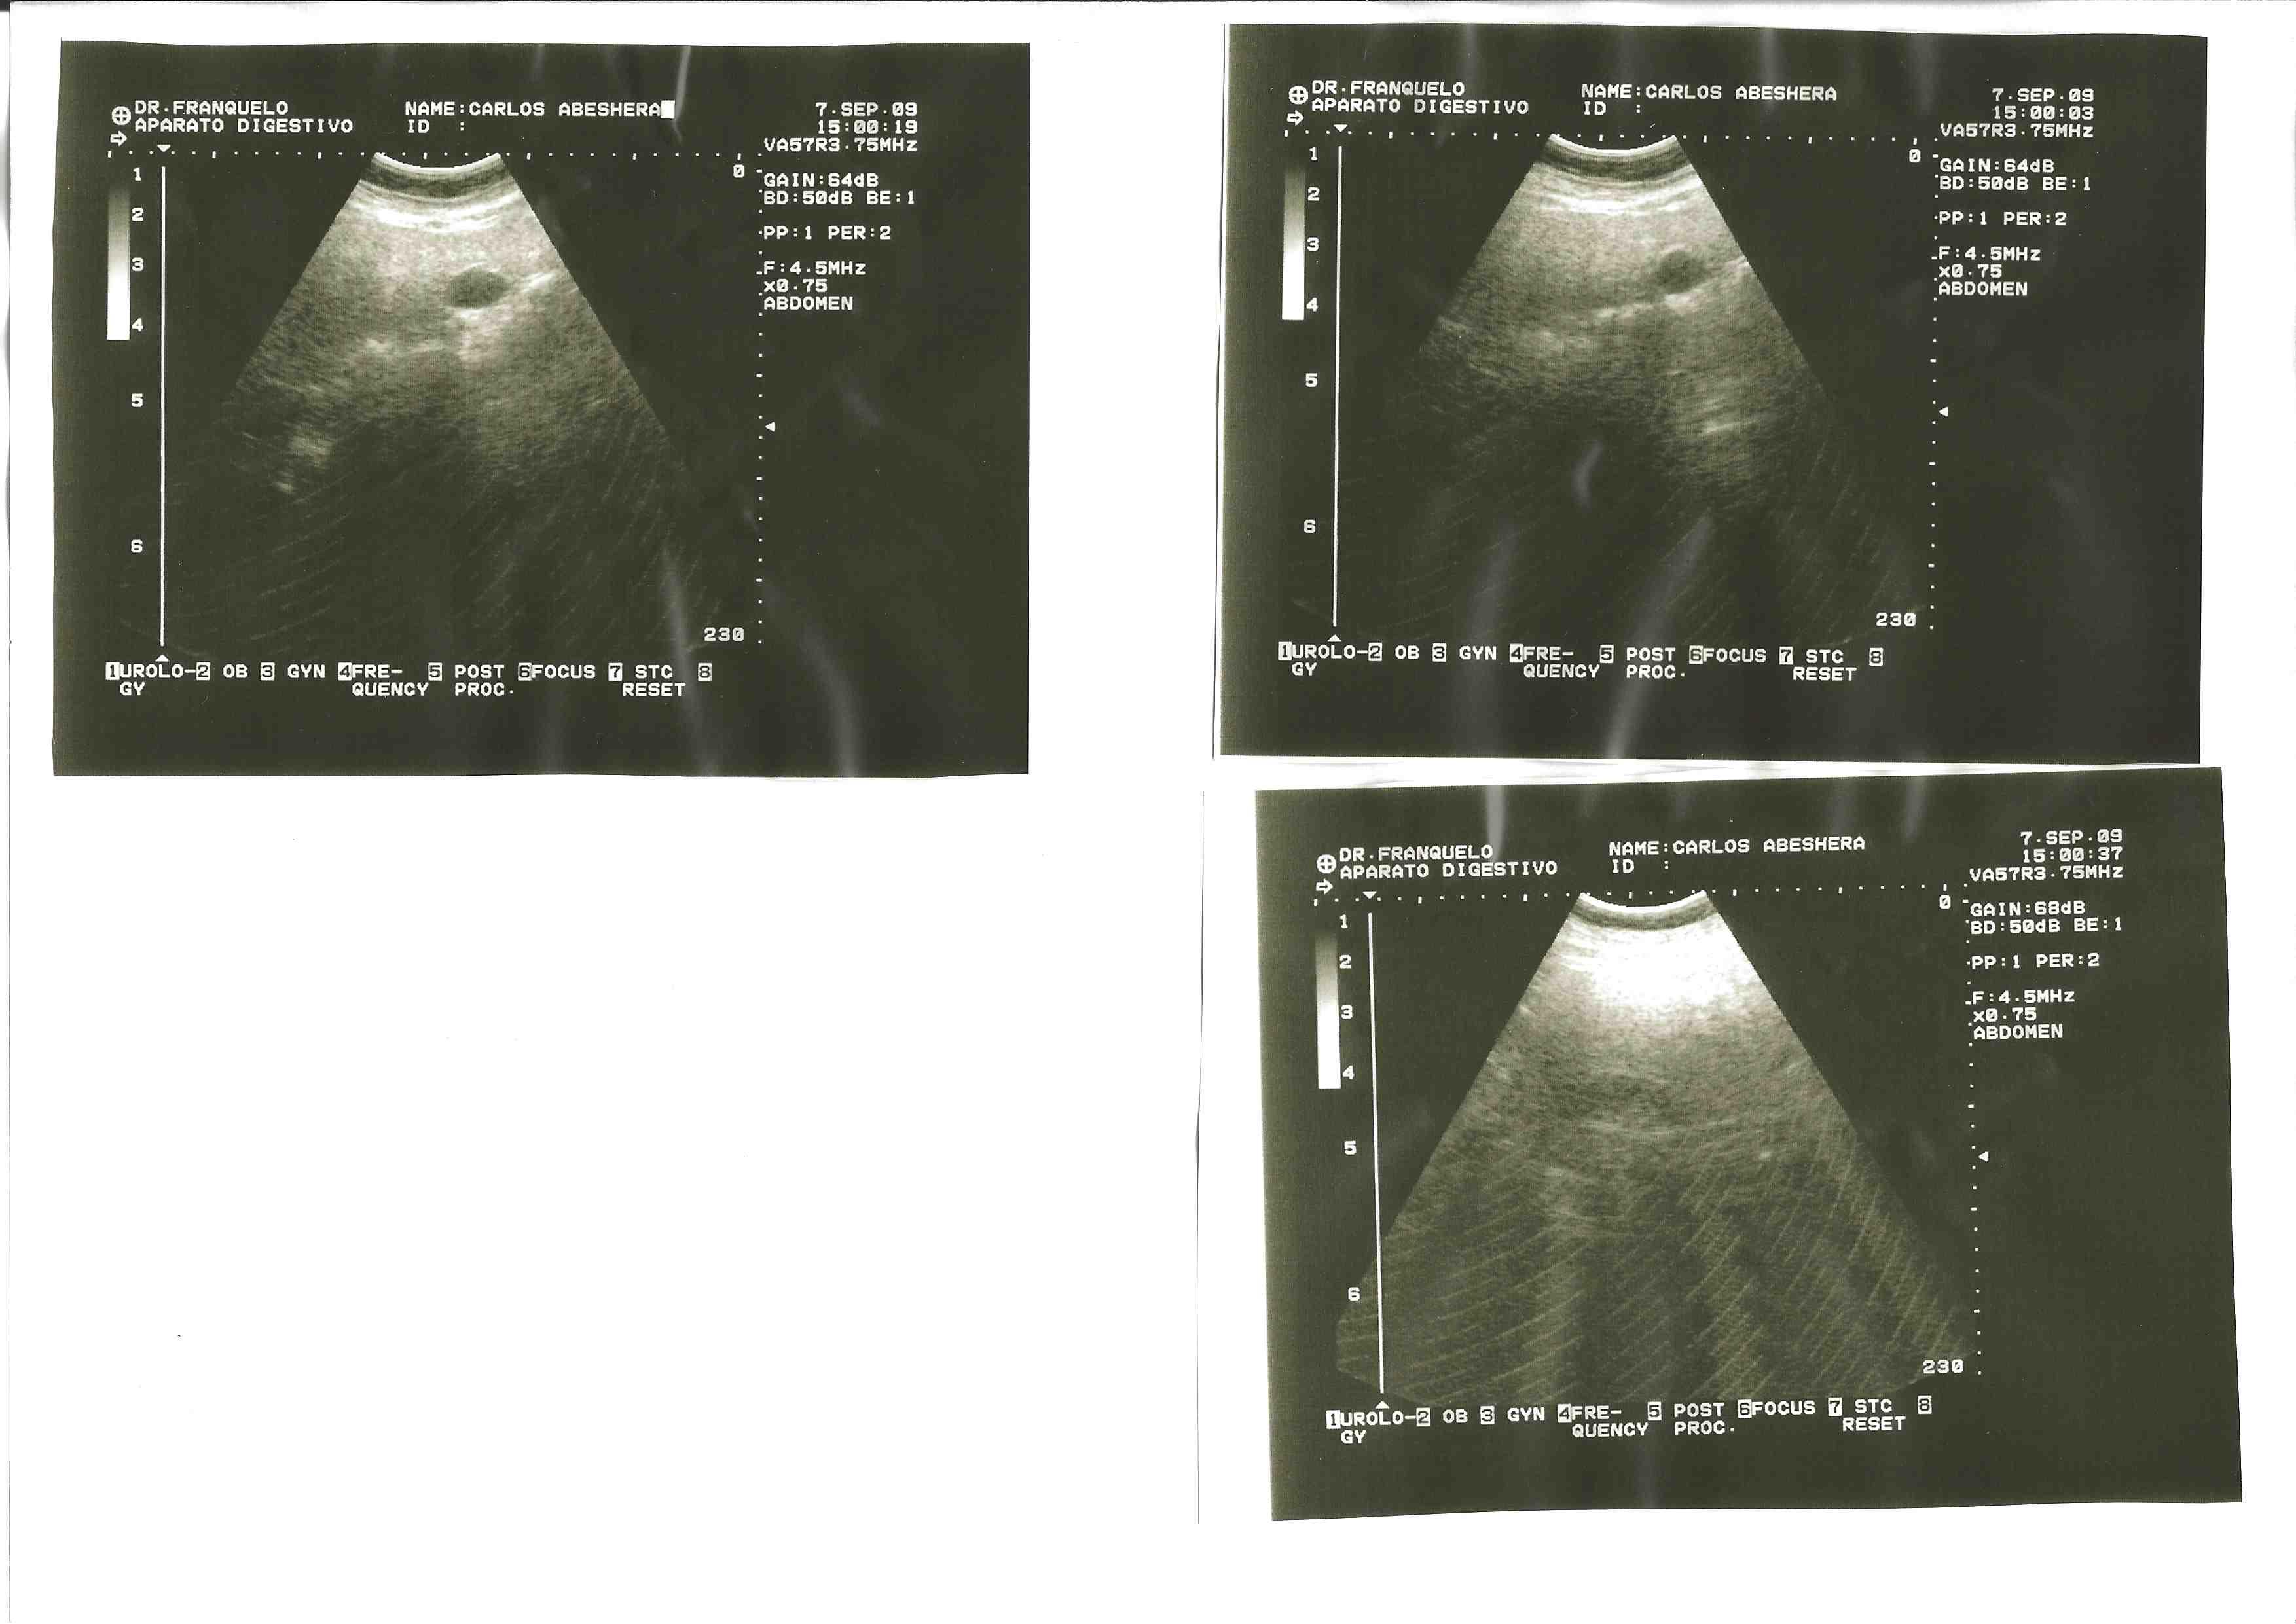 4 - 7 Septiembre 2009 - Digestivo